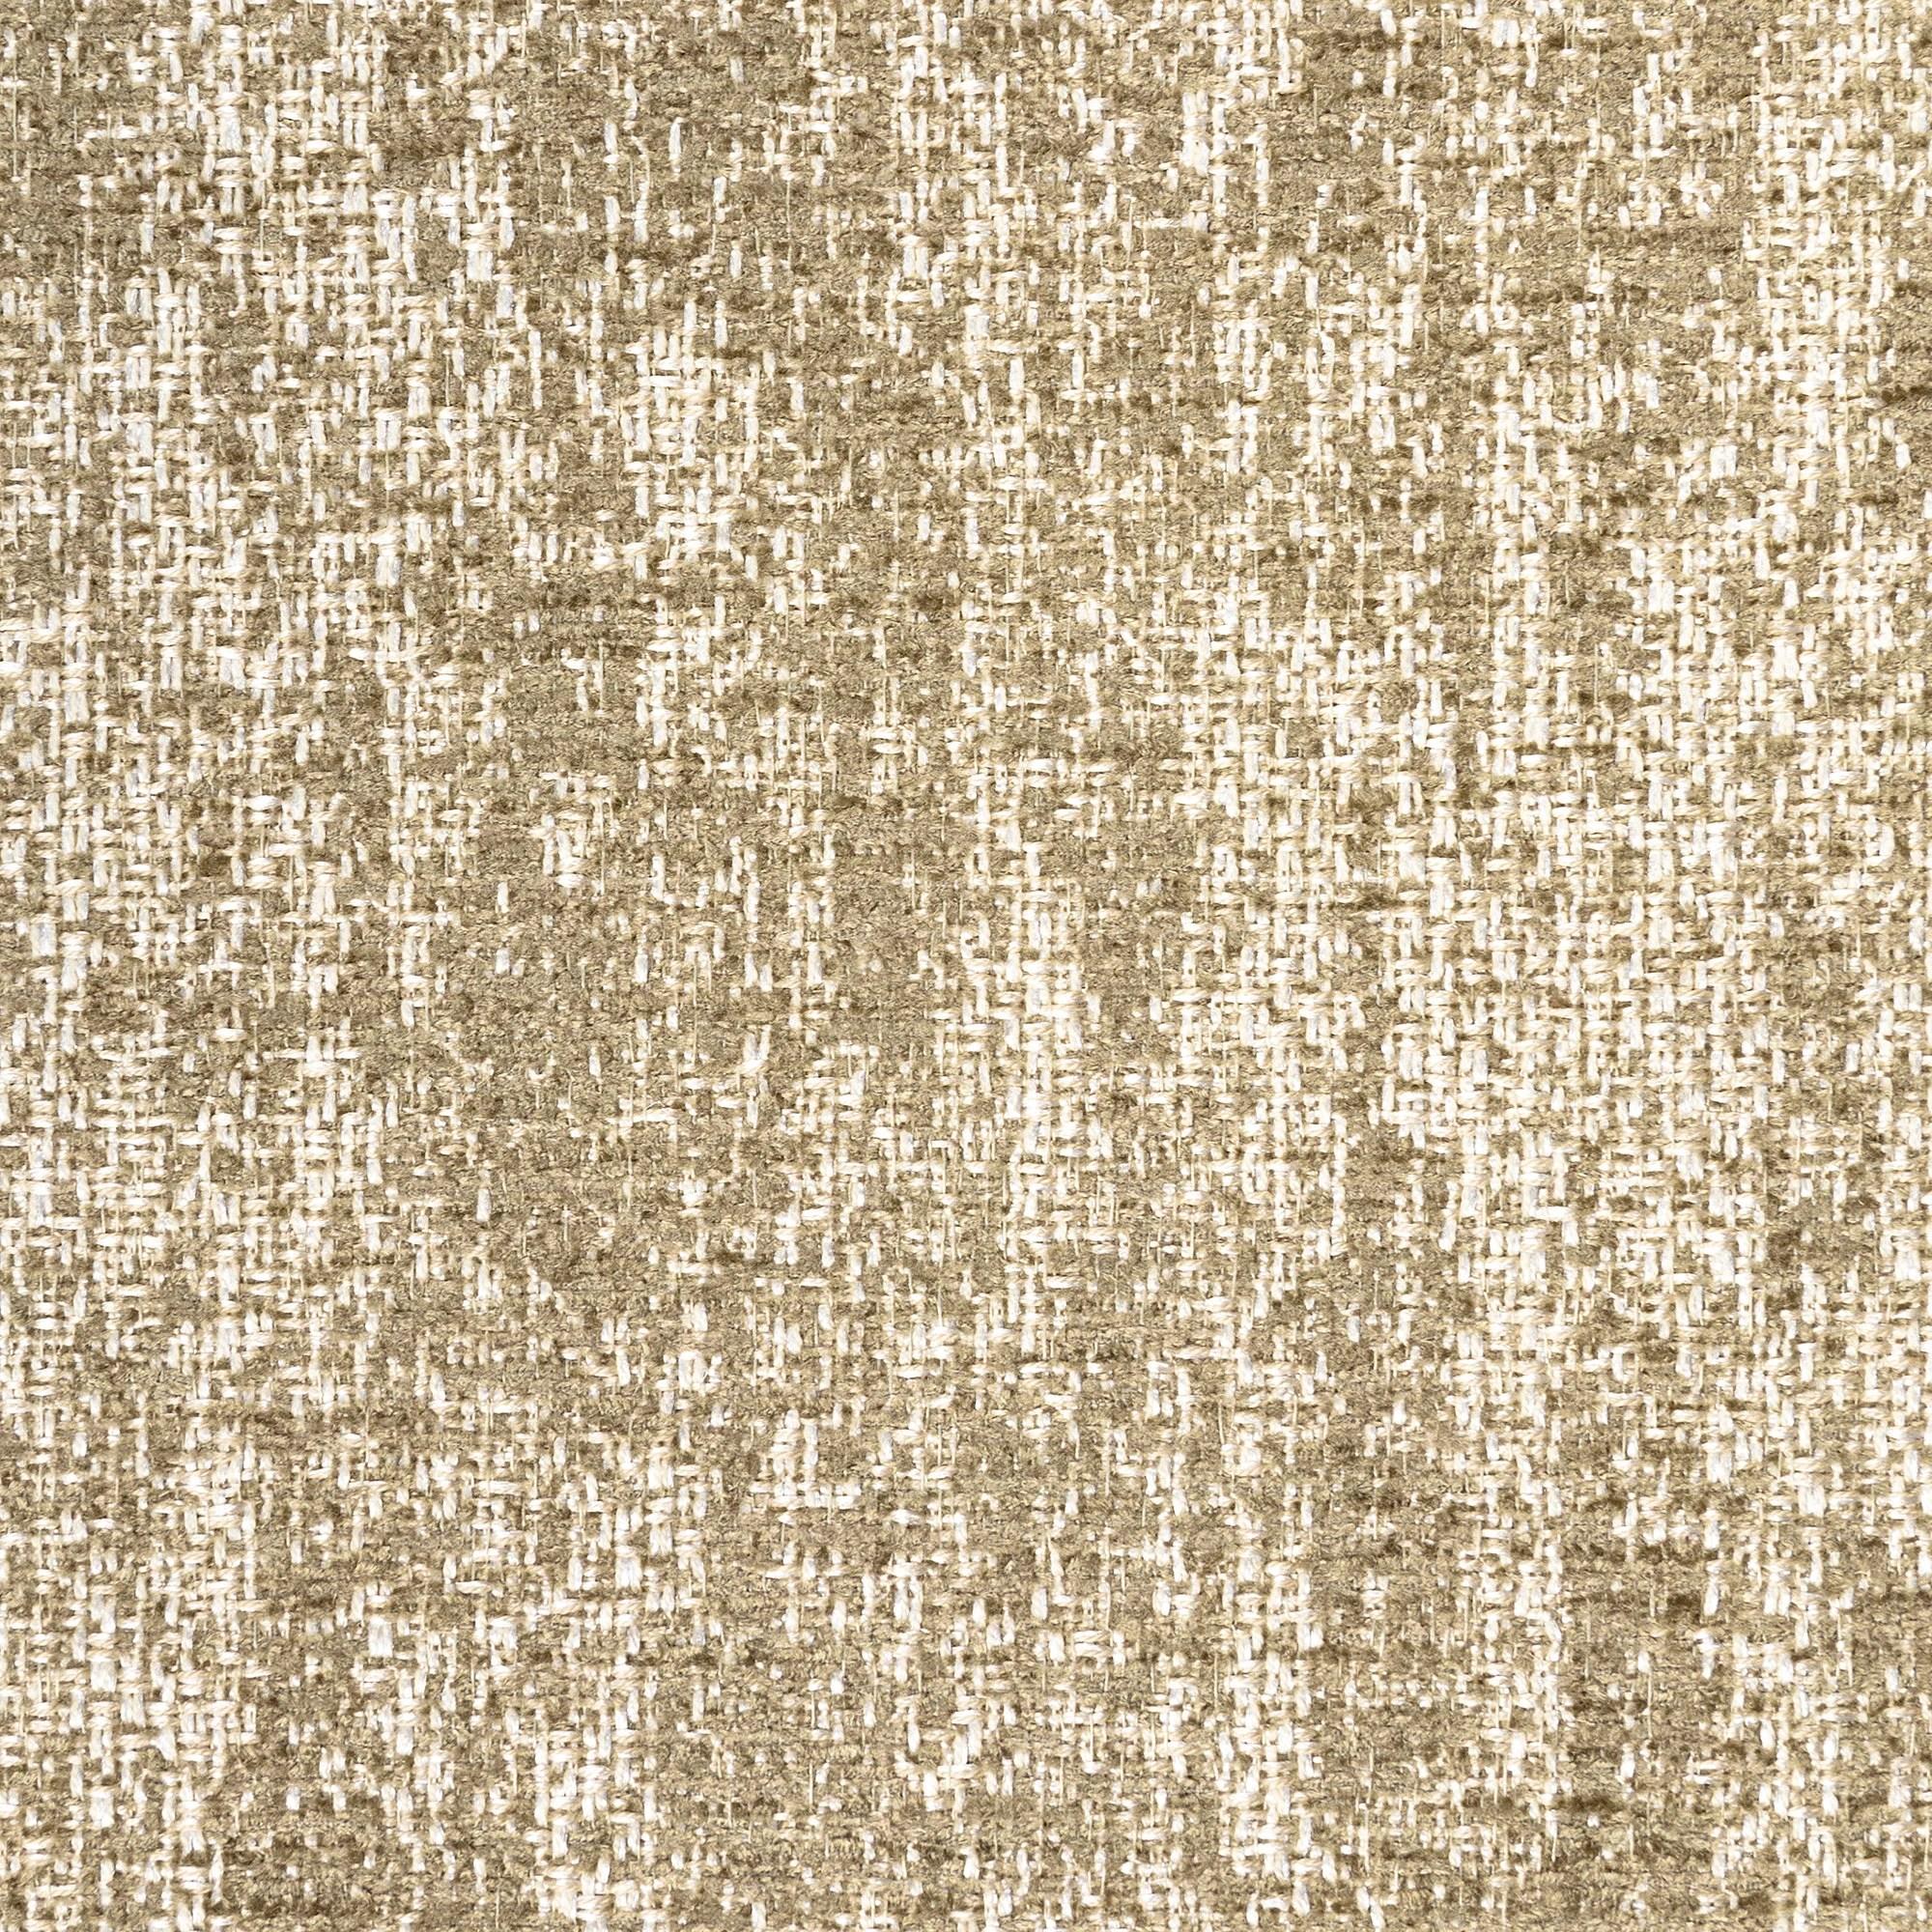 olive green beige curtain fabric textured plain chenille soft cushion blind